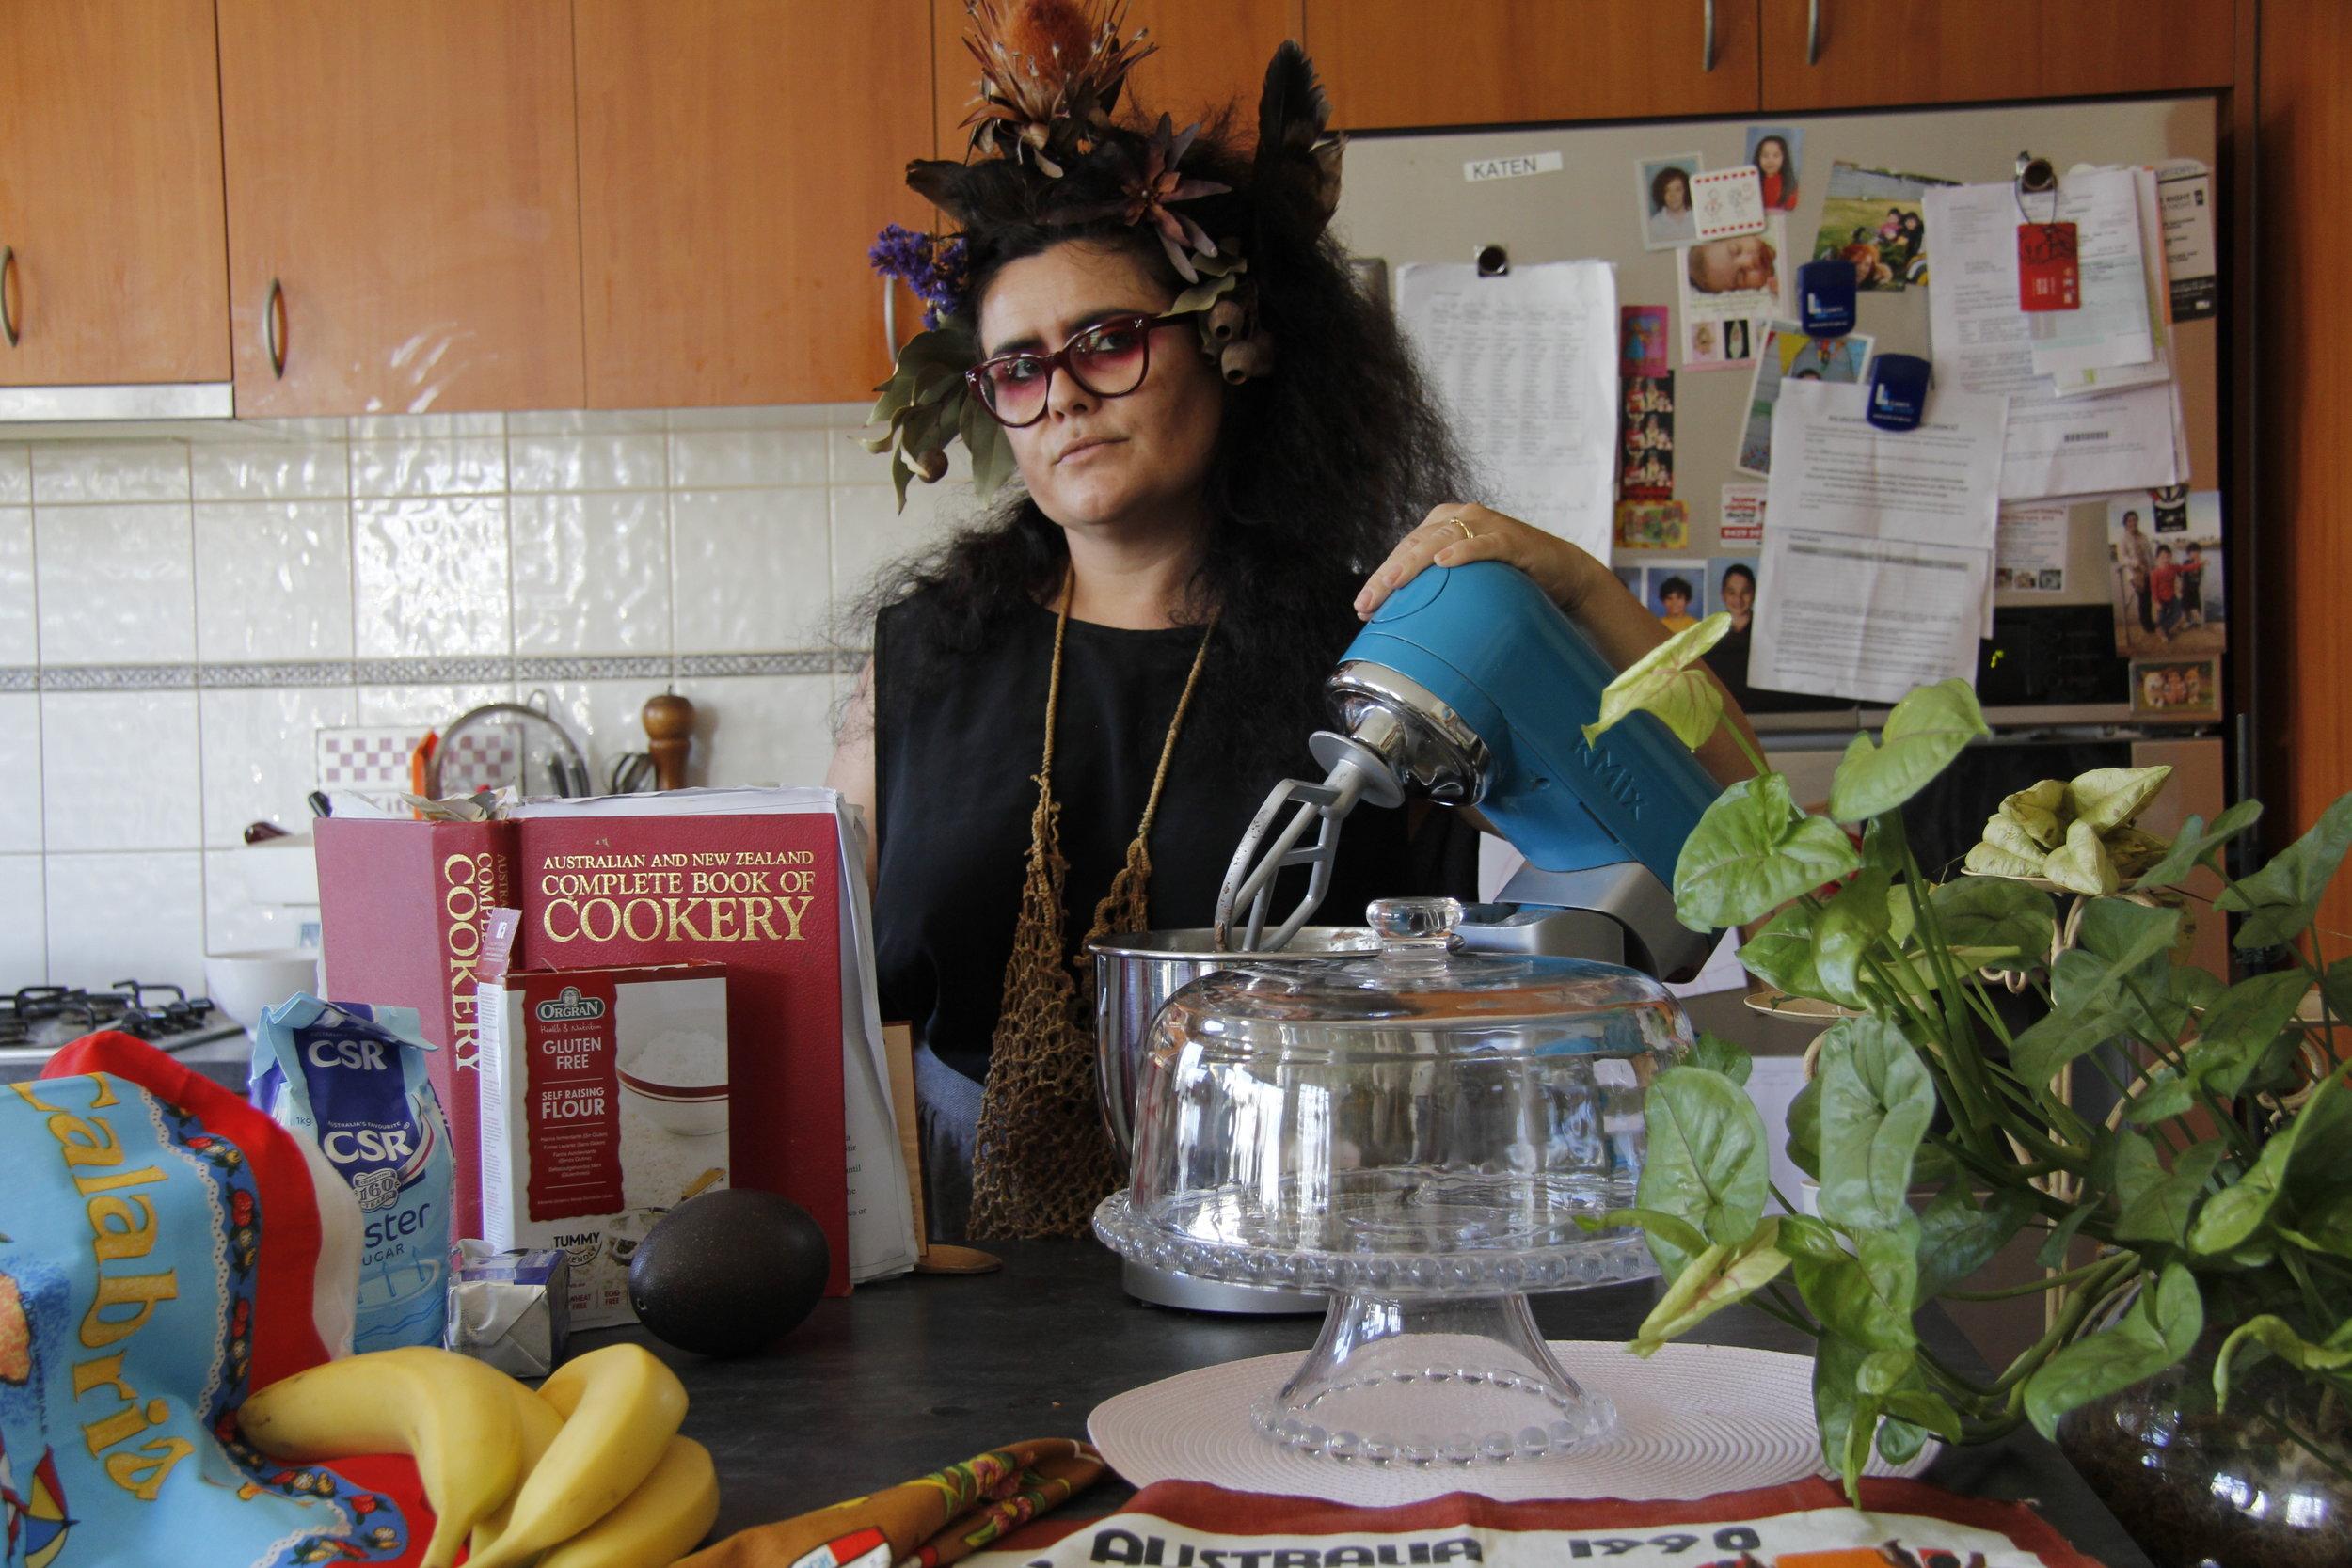 Mok Mok Bakes Emu Egg Chocolate Cakes-gluten free and everything Paola Balla 2016.JPG